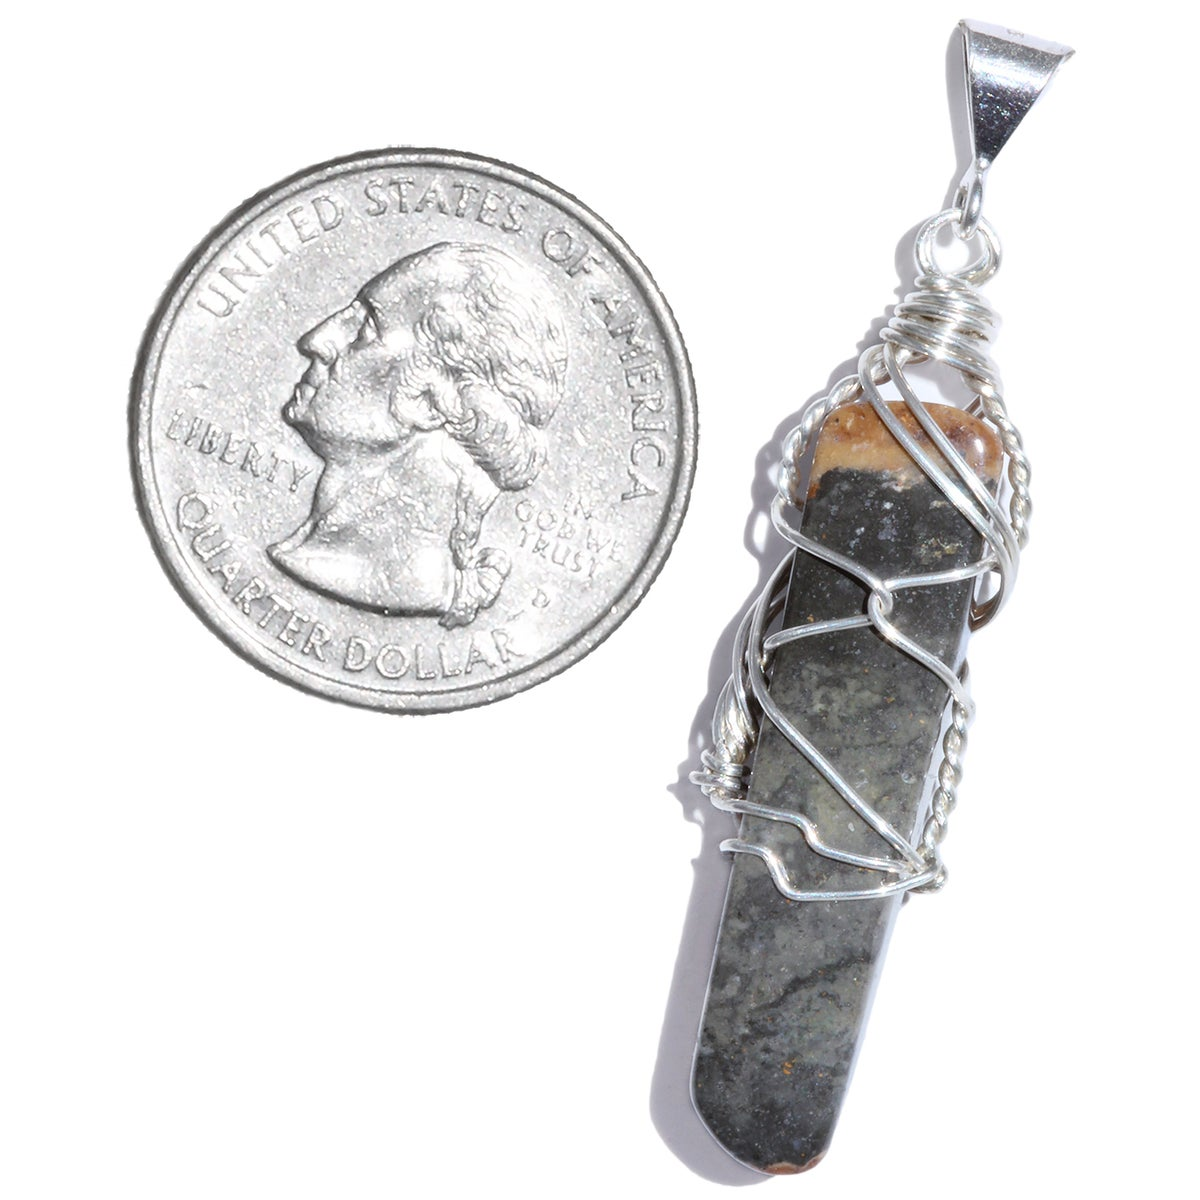 Revelation Stone Handmade Pendant